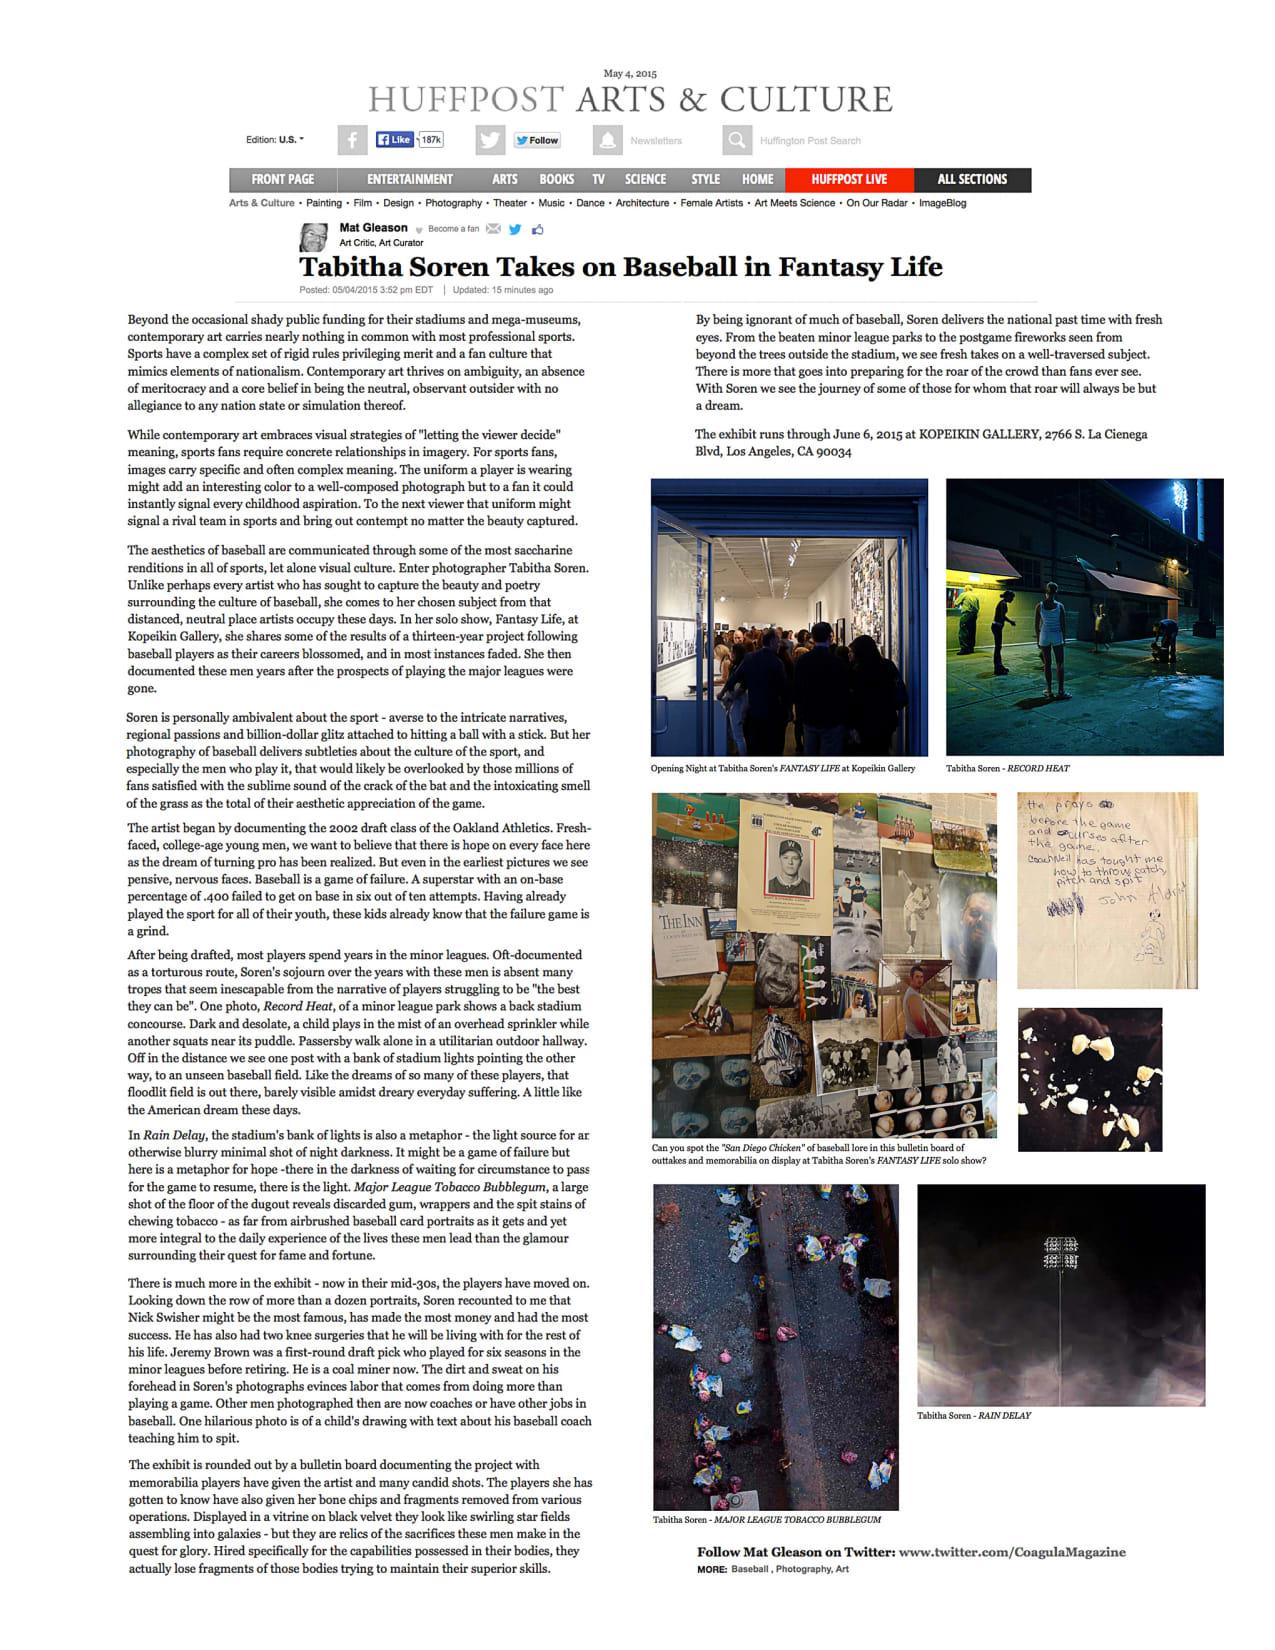 Photography by Tabitha Soren at Private Residence, Phoenix - Fantasy Life, Drowning Superhero, Baseball, Pool, Underwater